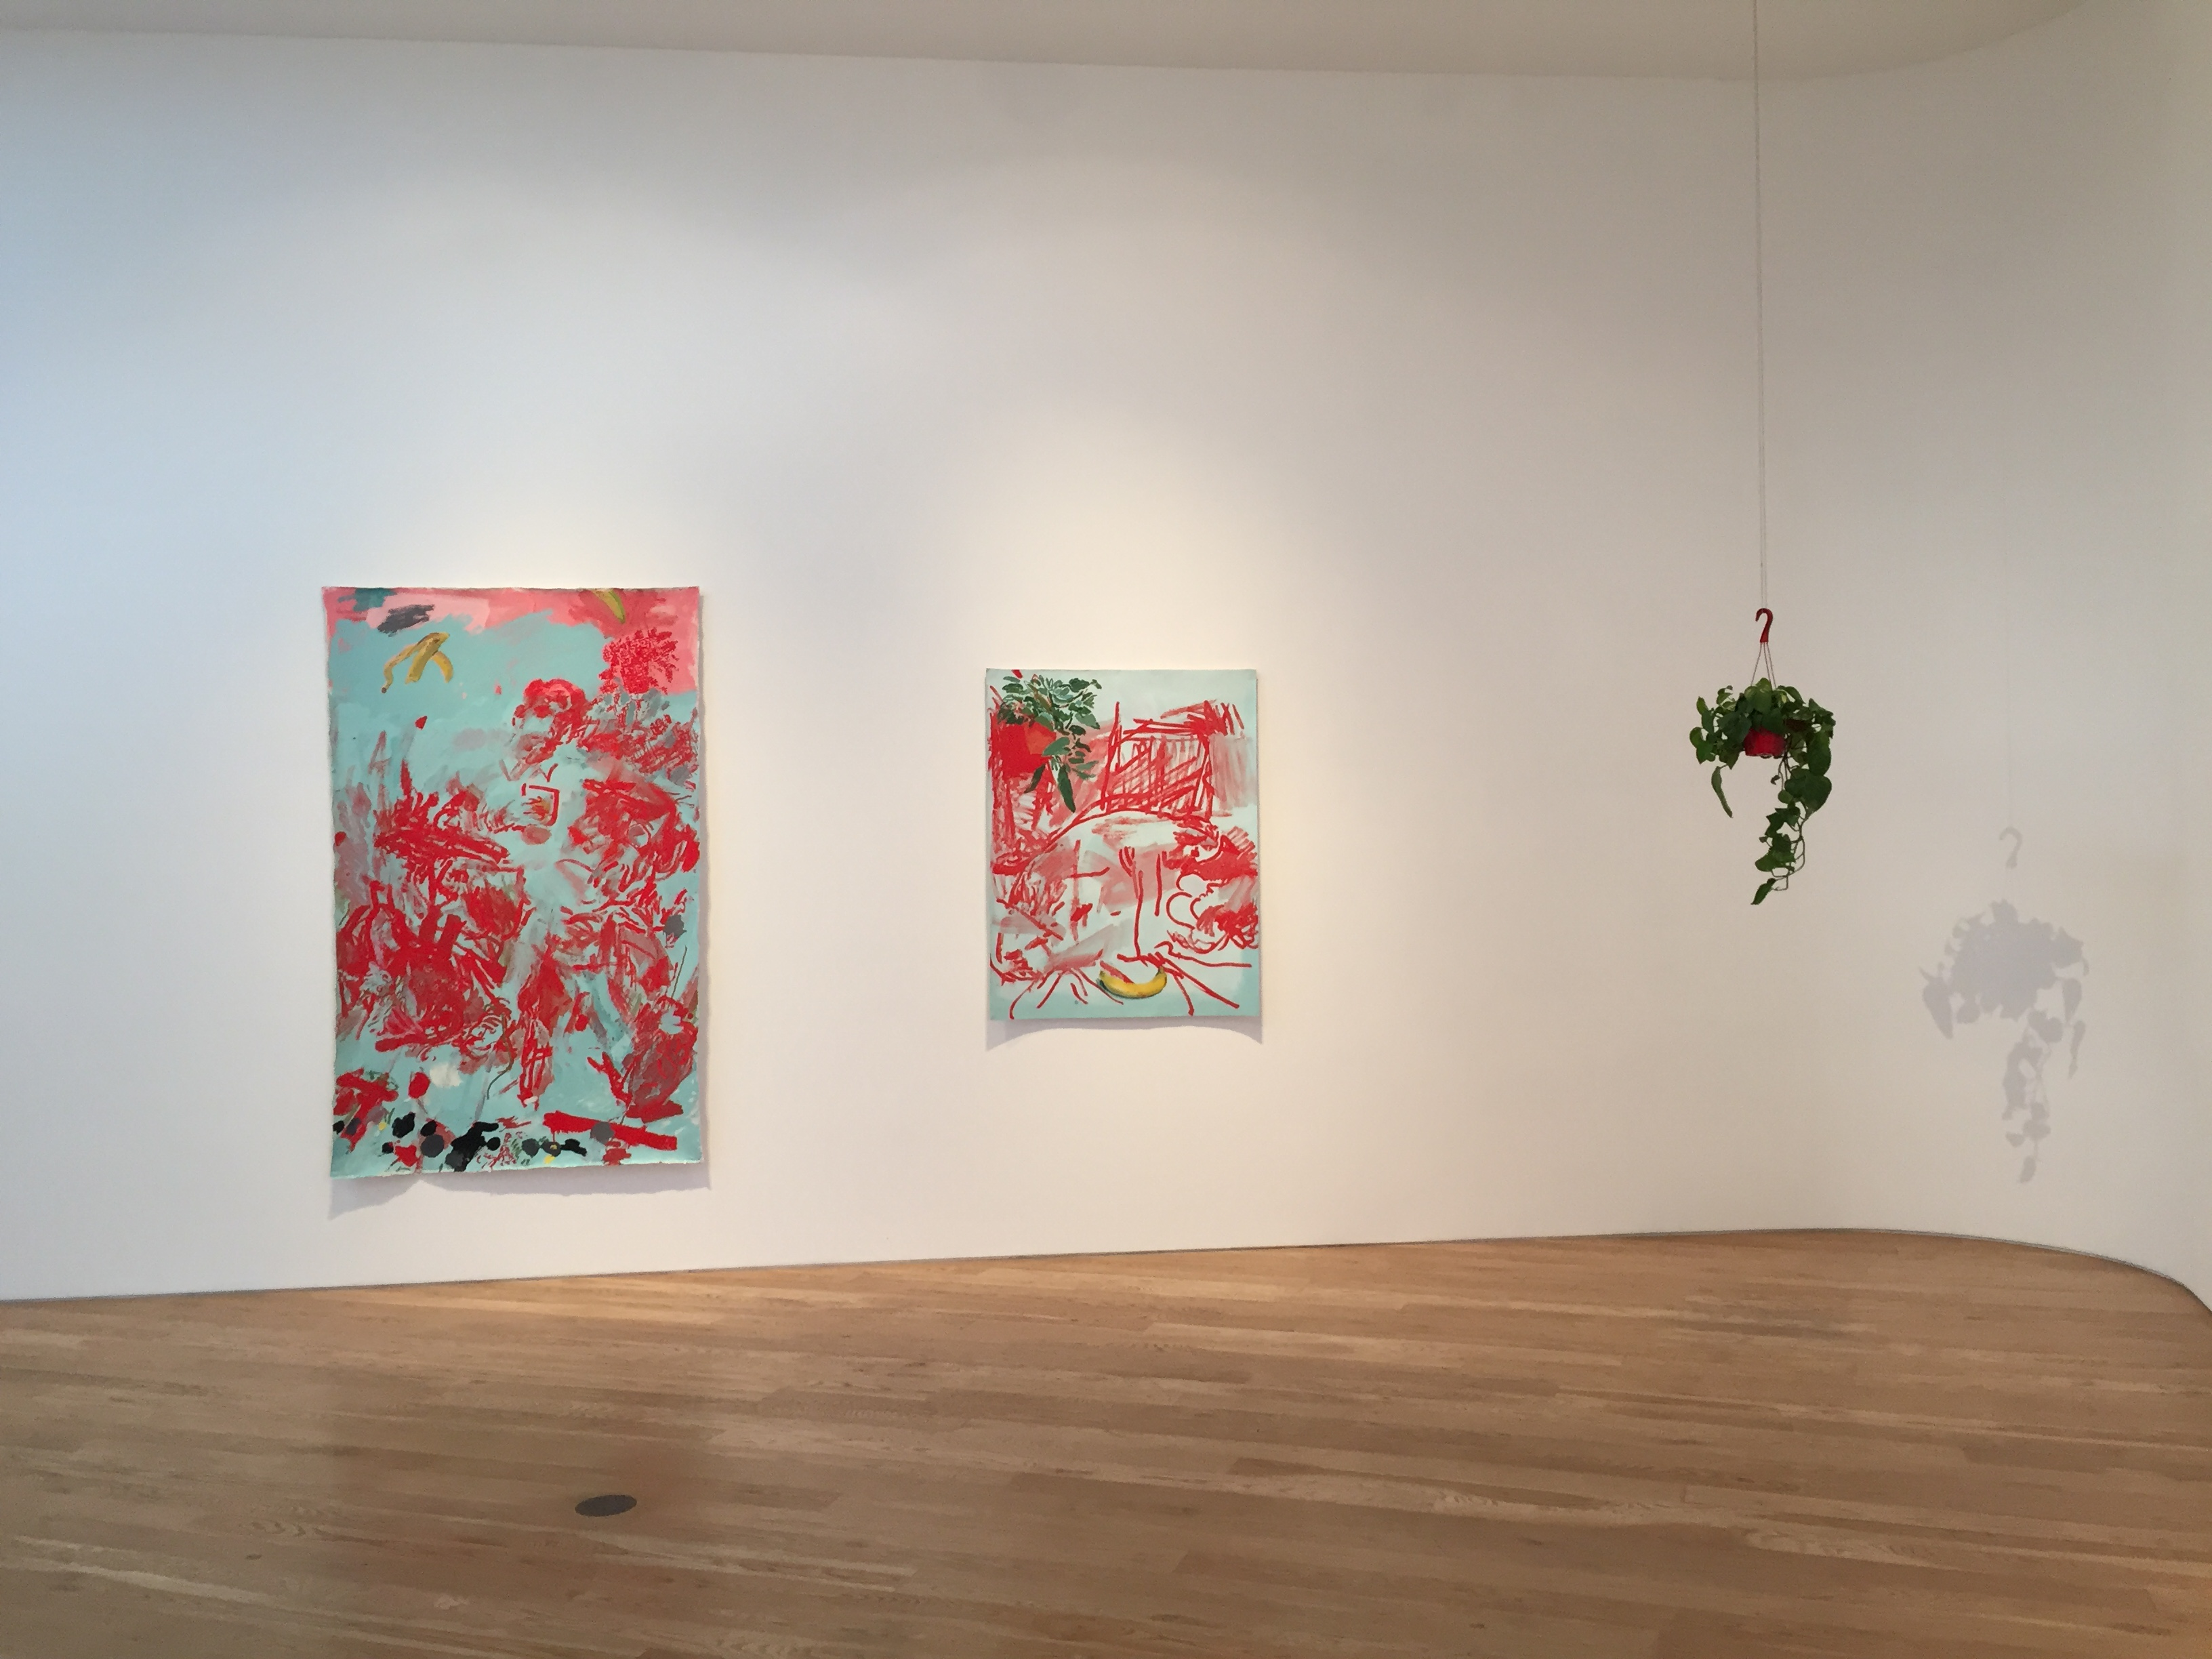 Frank stockton exhibition